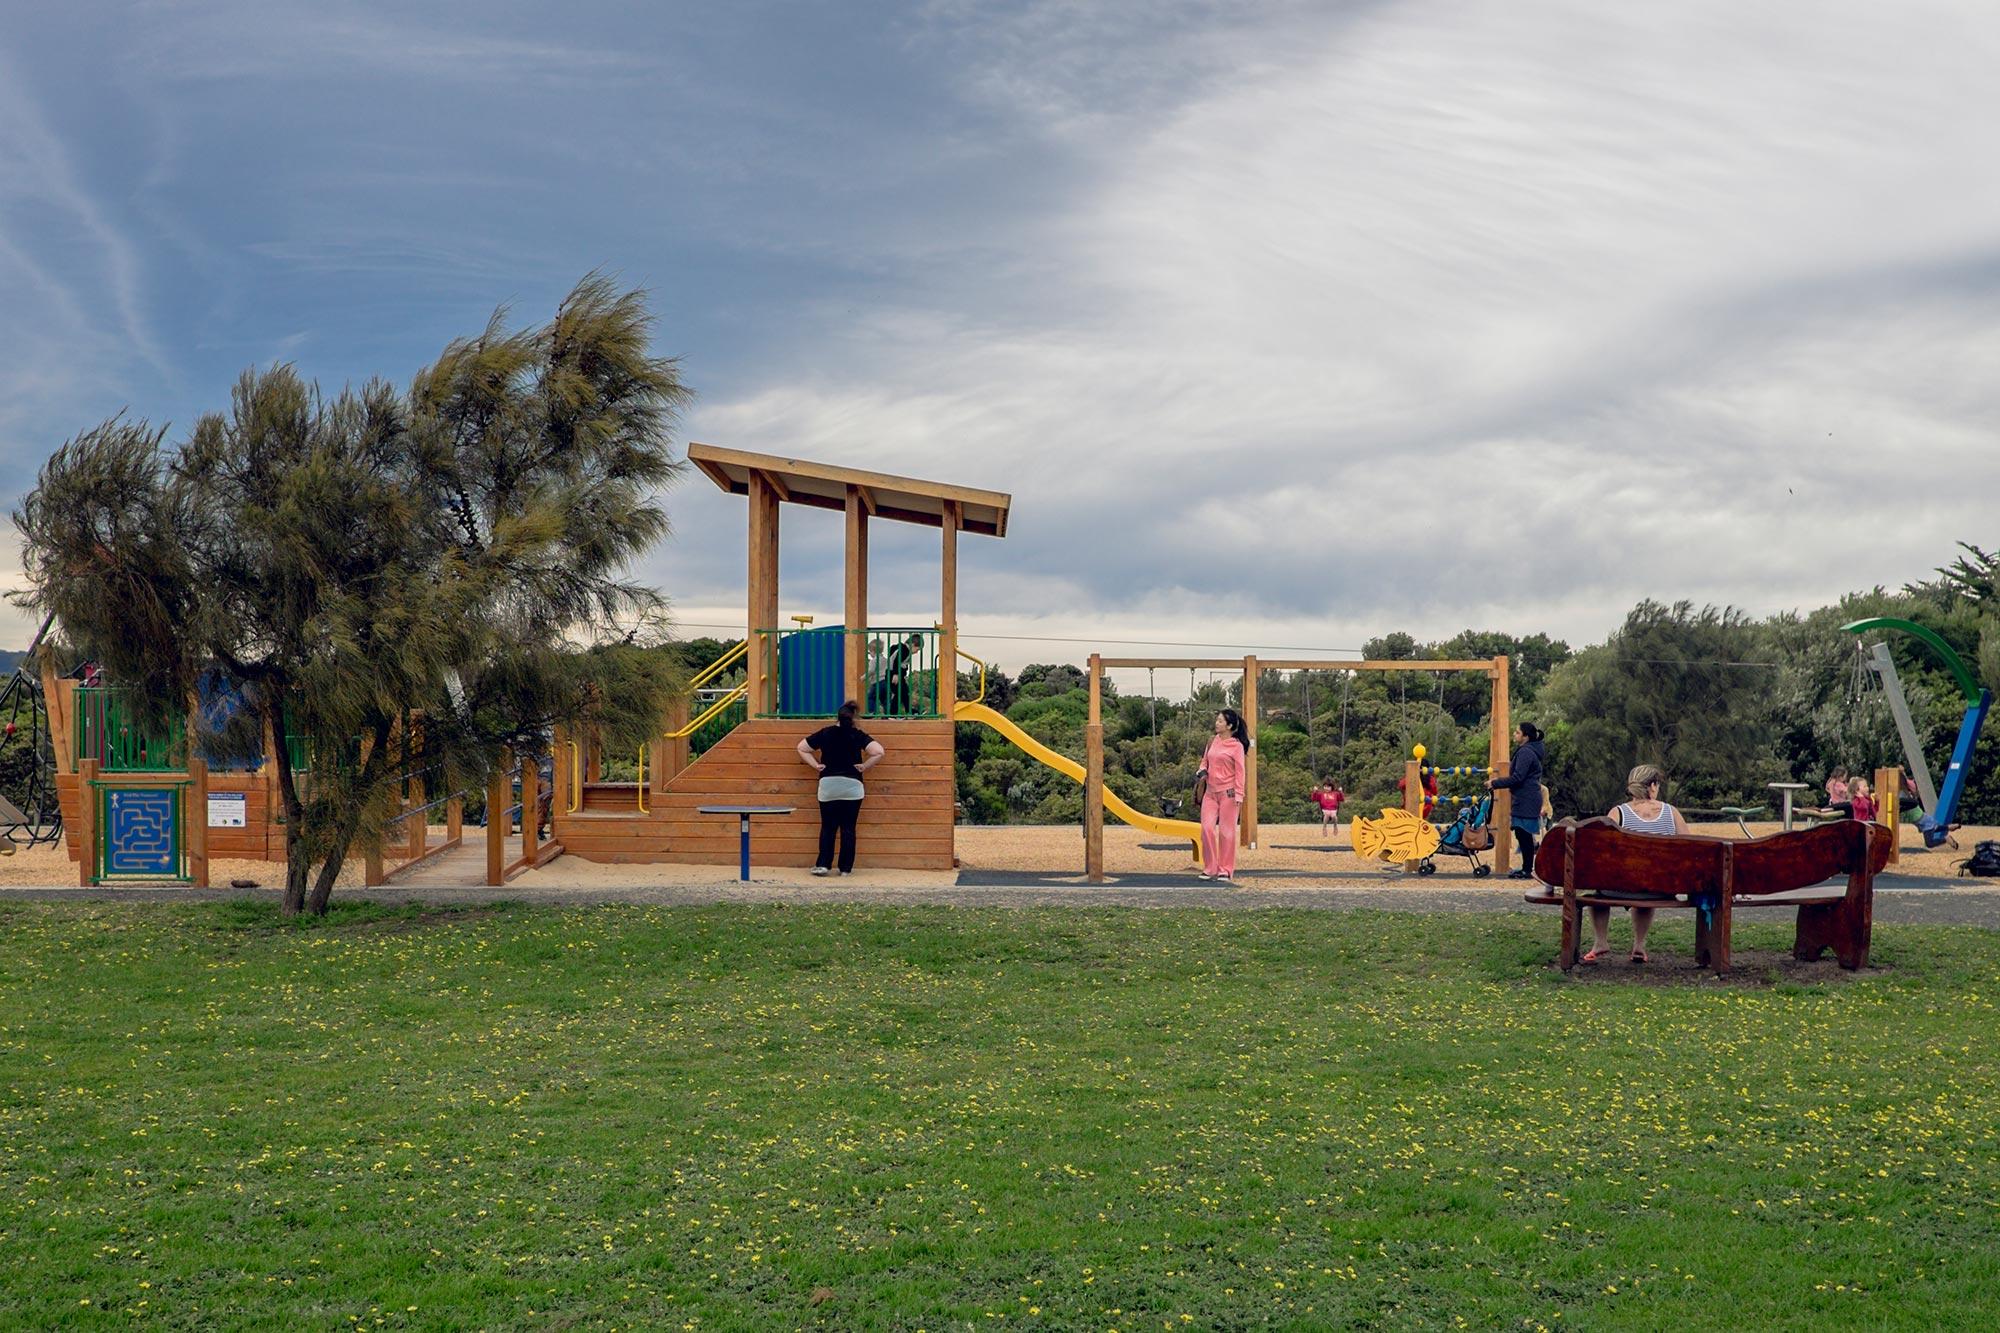 australia-melbourne-great-ocean-road-apollo-bay-playground